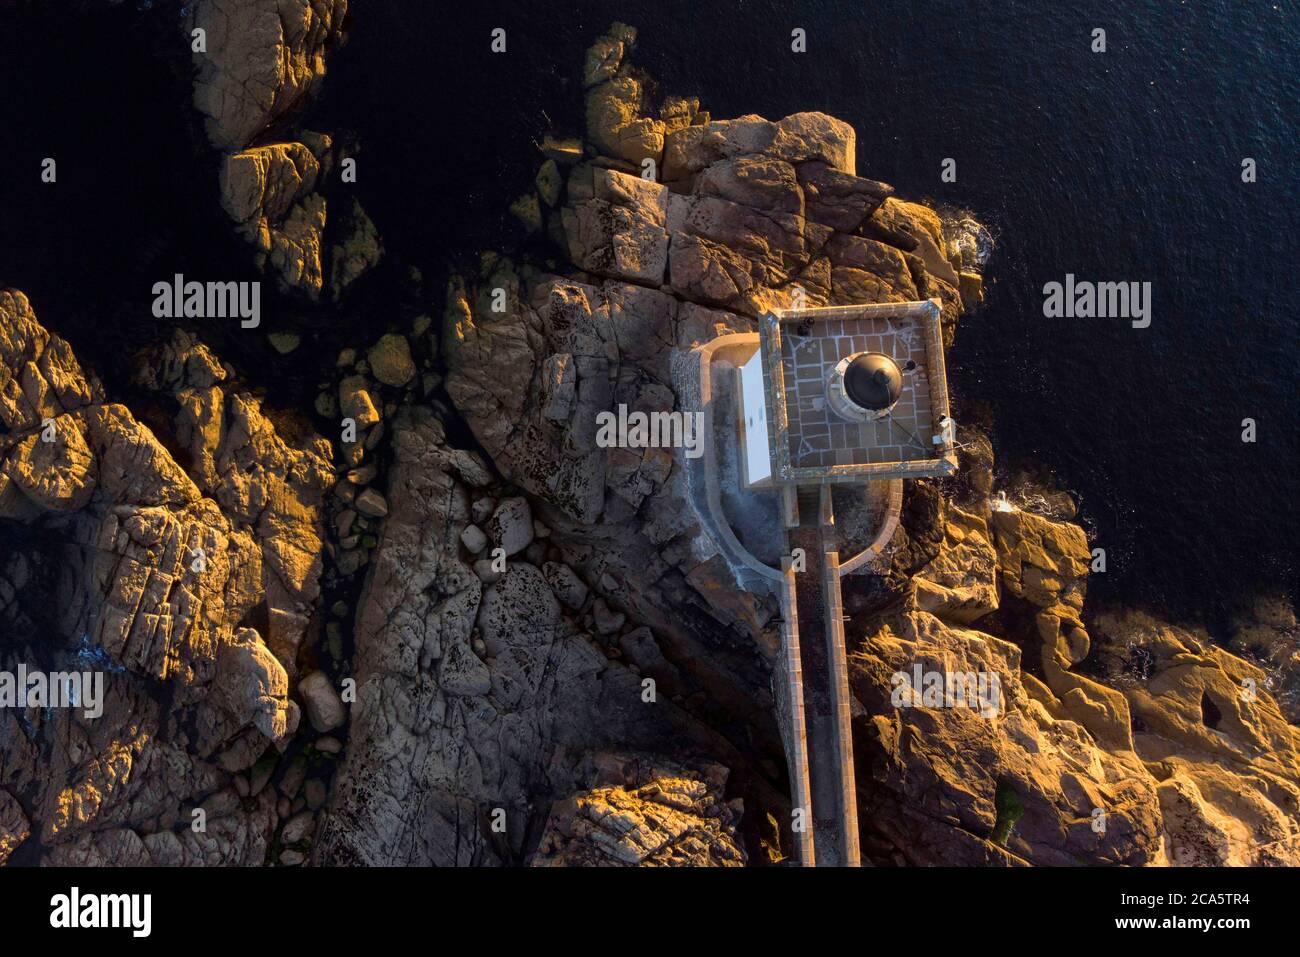 France, Finistere, Iroise see, Armorique Regional natural park, Le Conquet, Kermorvan peninsula, Pointe de Kermorvan and Kermorvan lighthouse (aerial view) Stock Photo